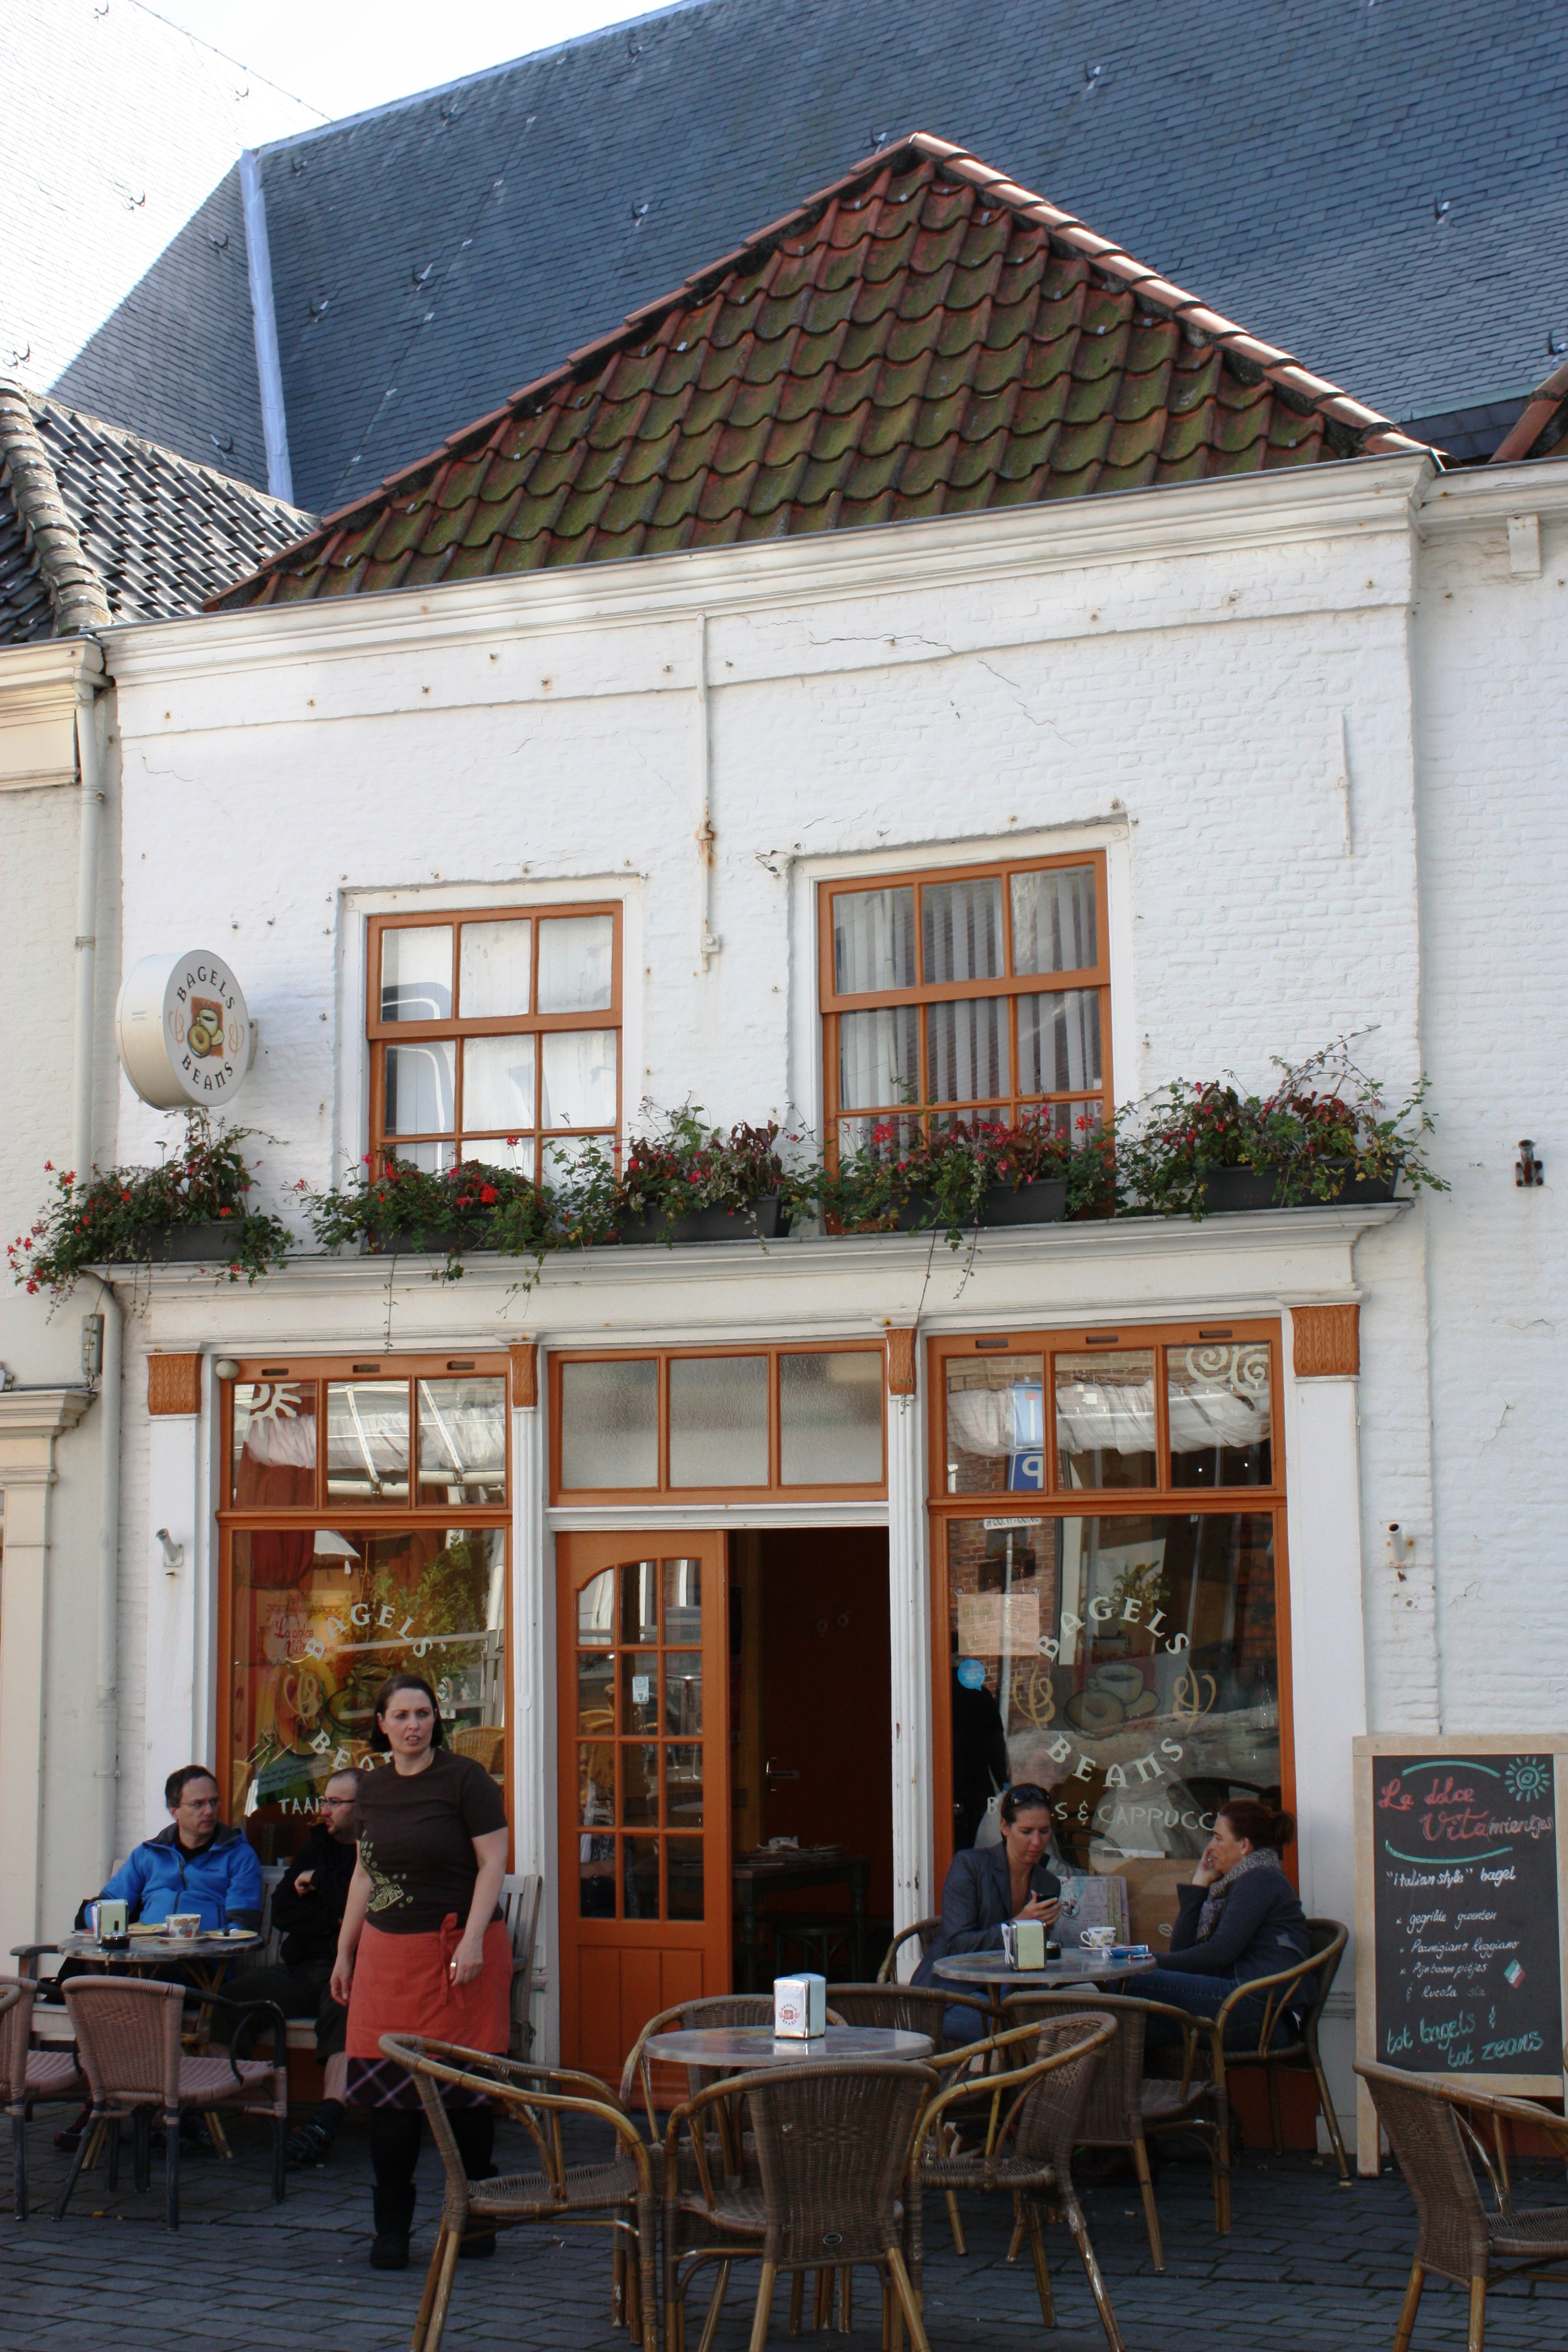 Huis met geverfde rechte gevel op de verdieping vensters met roedenverdeling moderne winkelpui - Moderne huis gevel ...